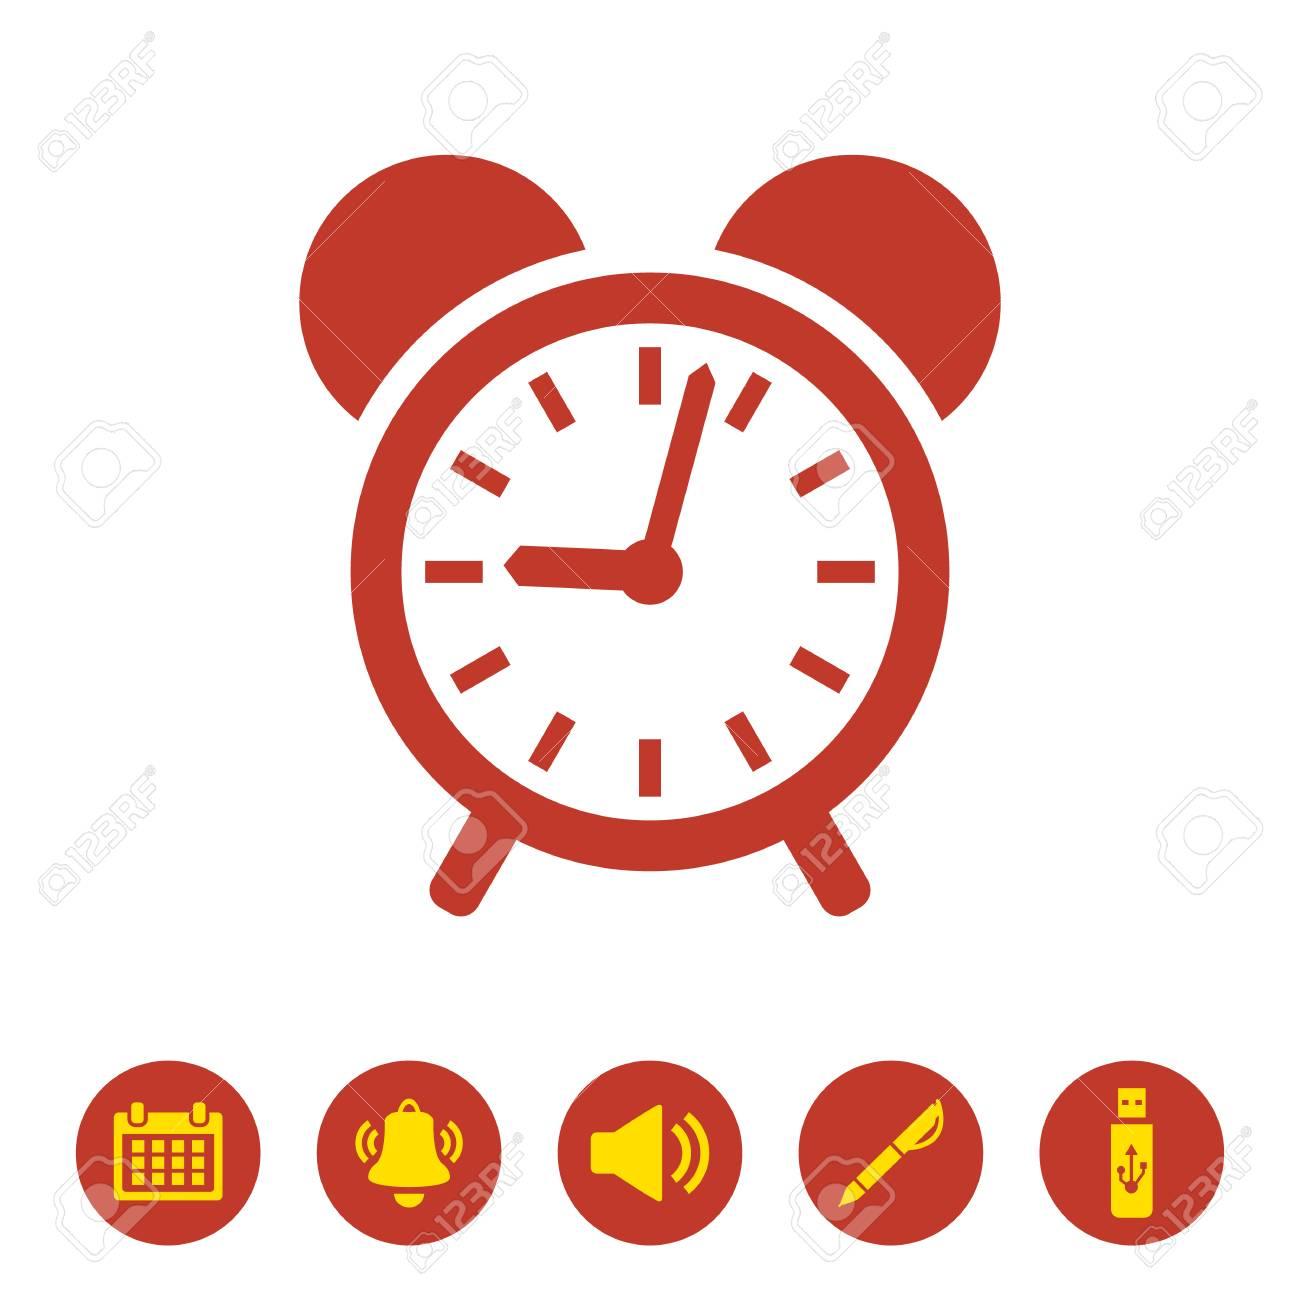 Alarm clock icon on white background. Vector Illustration - 125986420